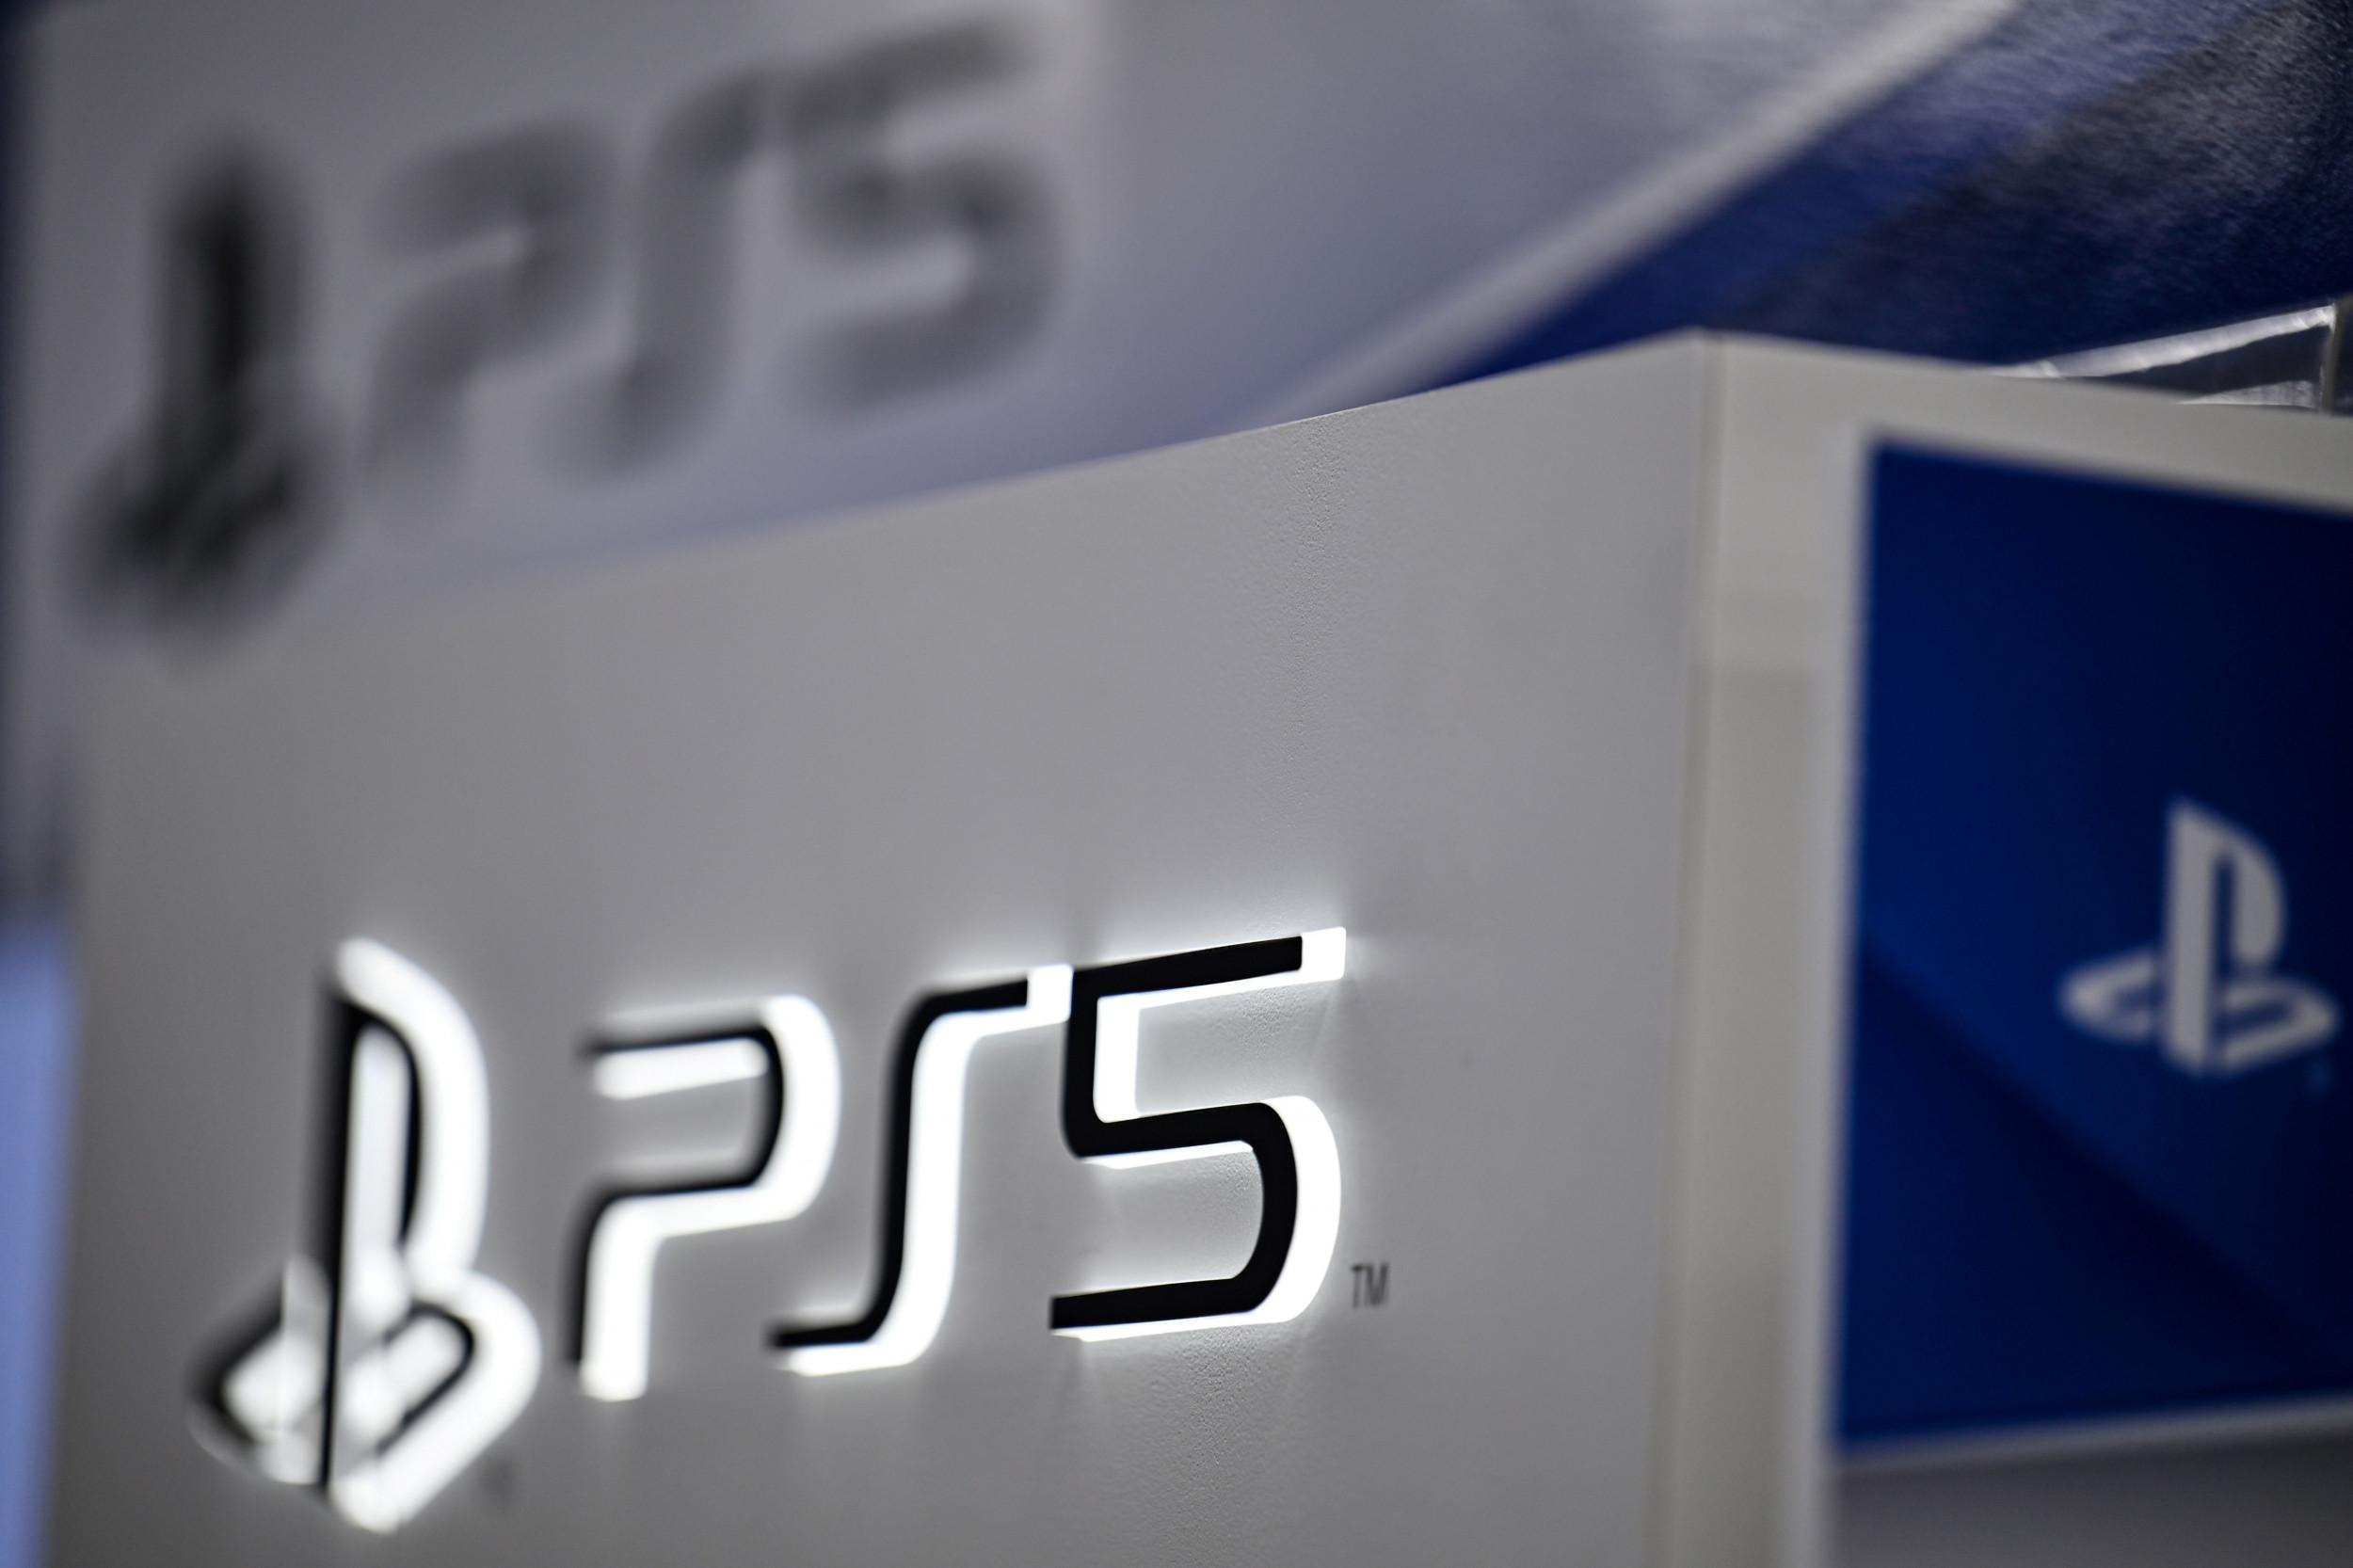 Ps5 Restock Update For Walmart Target Best Buy And More